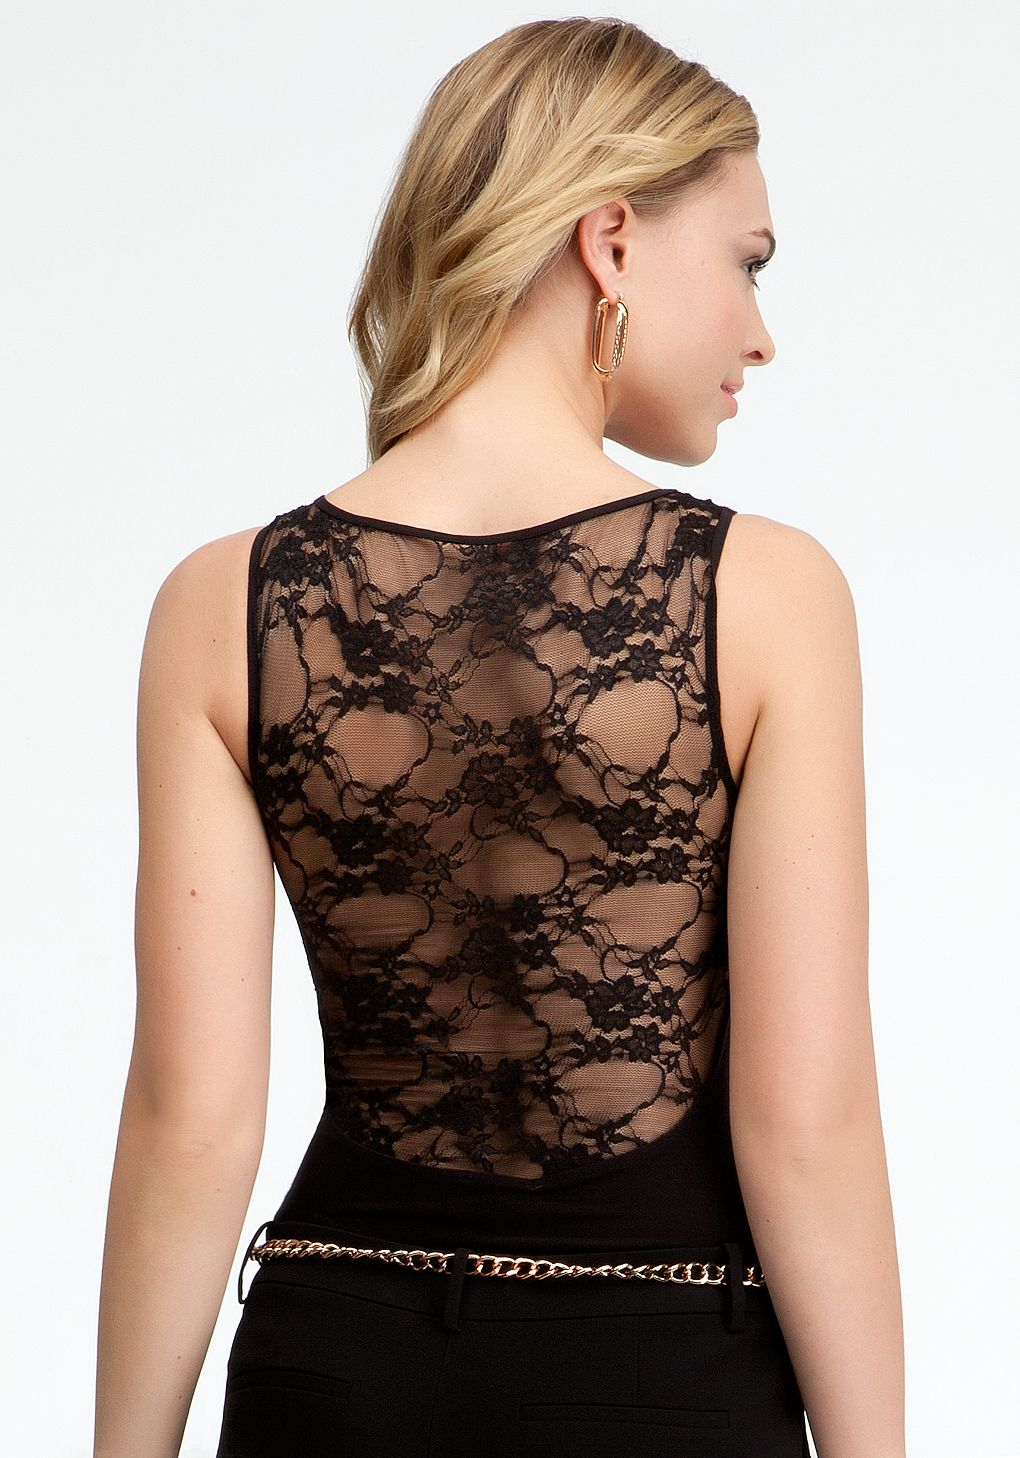 Lace bodysuit shirt  bebe  High Neck Lace Back Bodysuit  View All  Fashion u Style